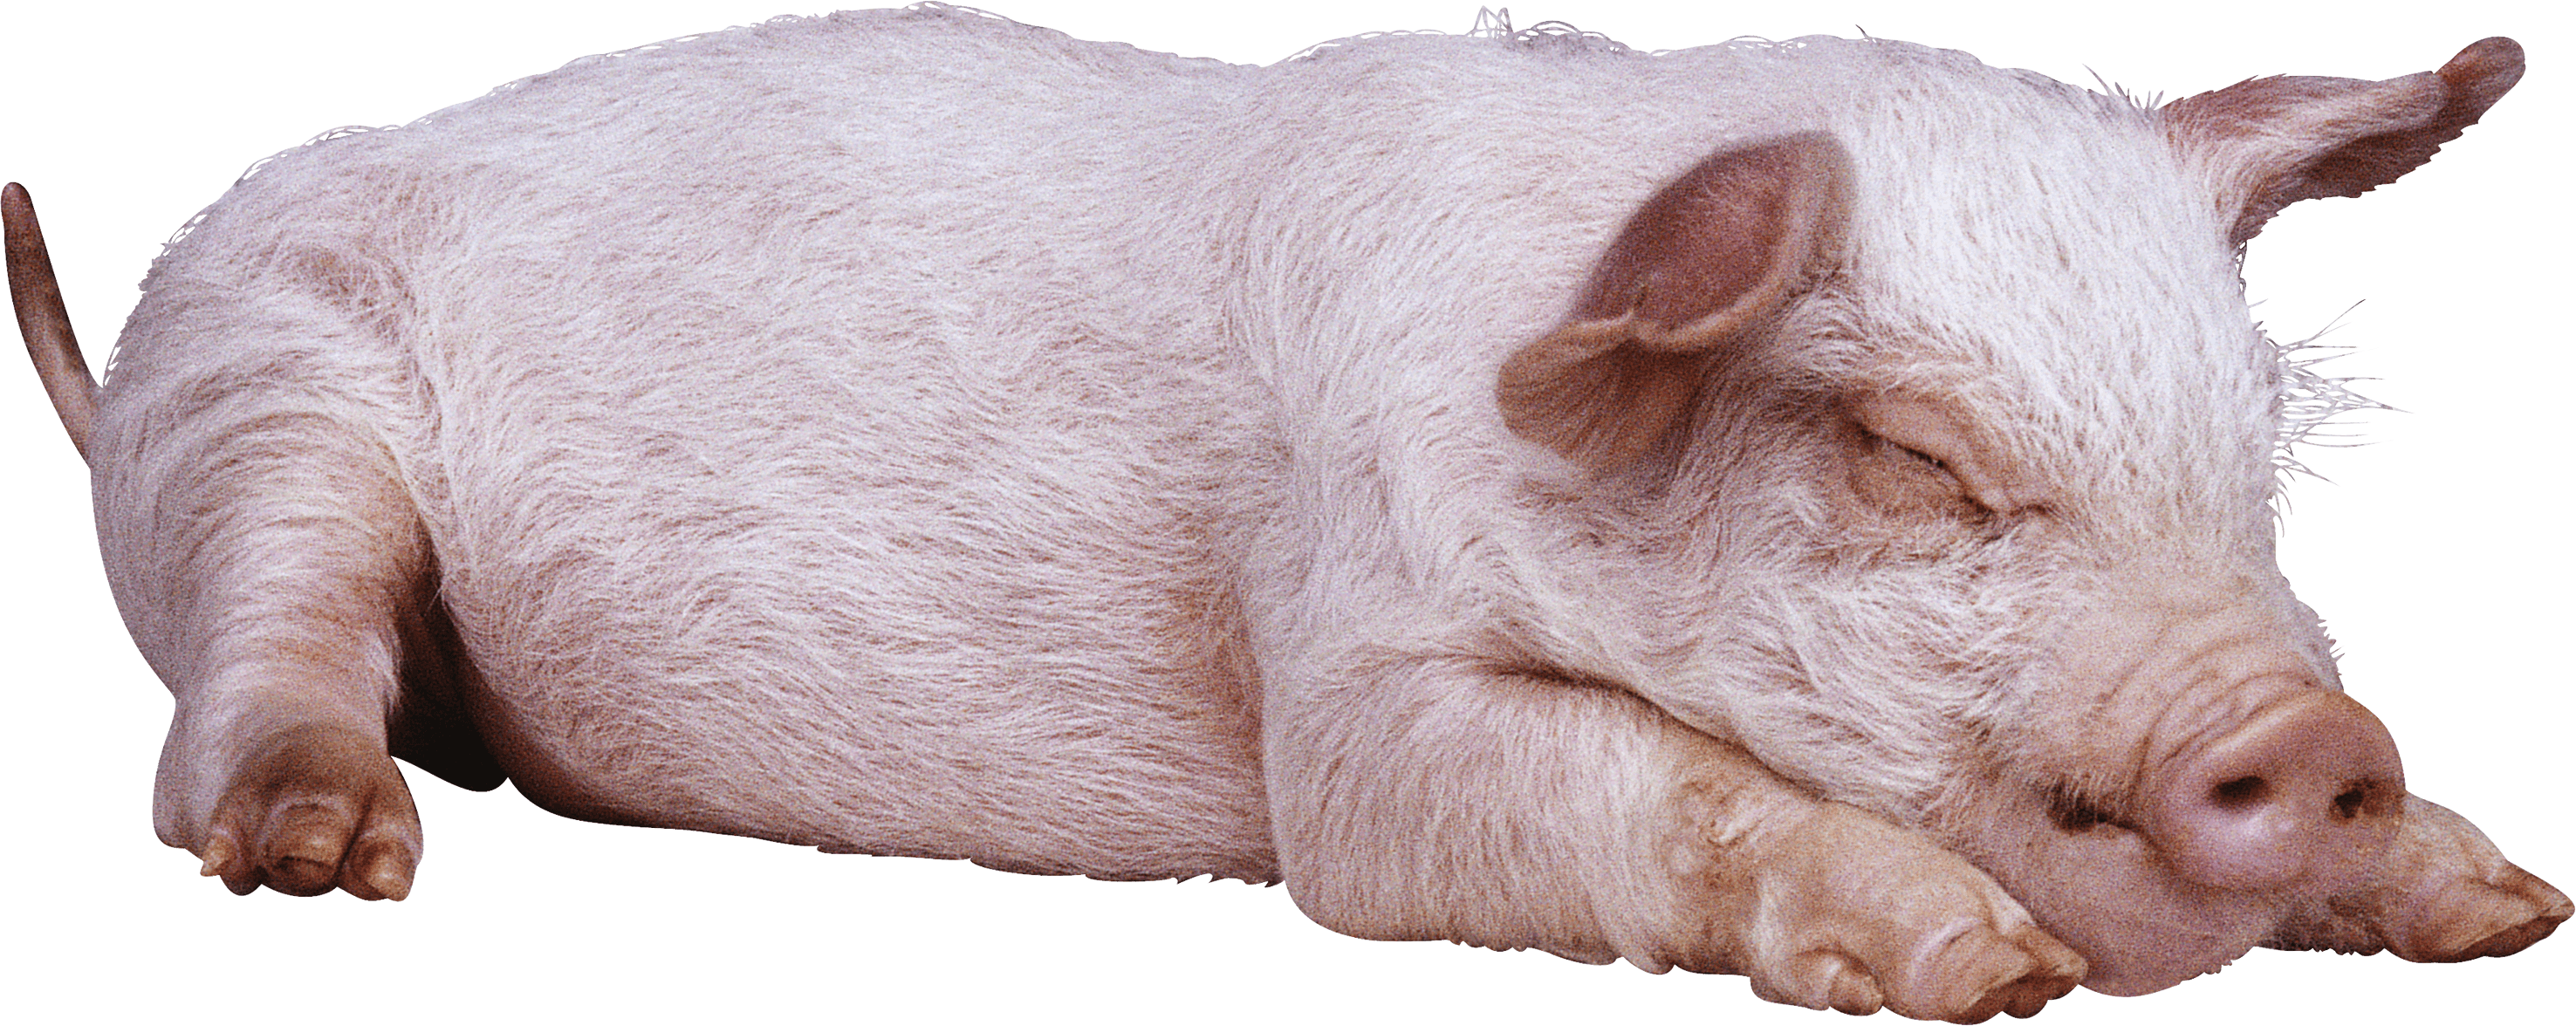 sleeping pig PNG Image